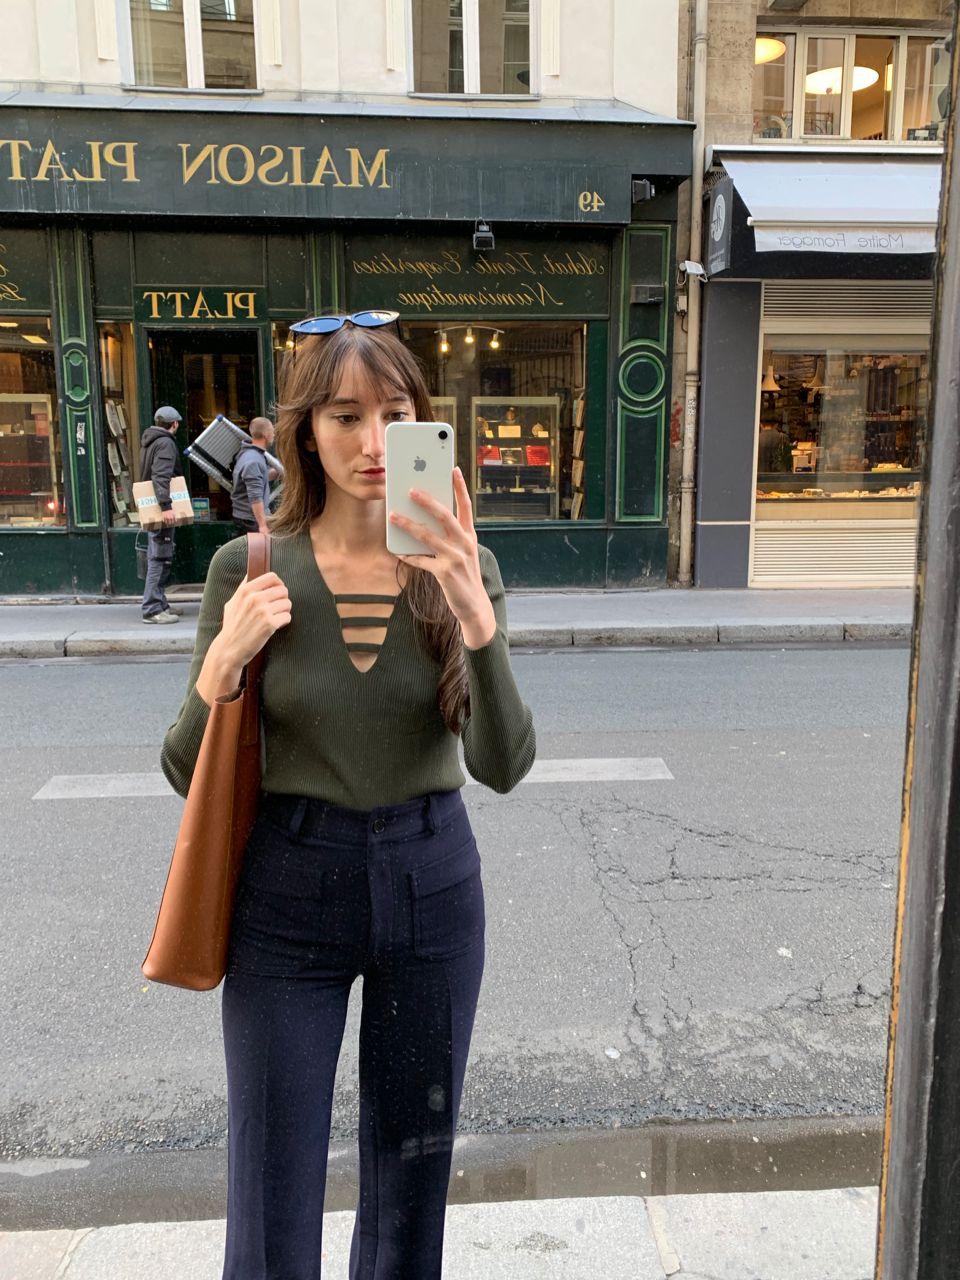 Early Fall Parisian Looks - Sandro Top, Nathalie Dumeix Pants, Everlane leather bag